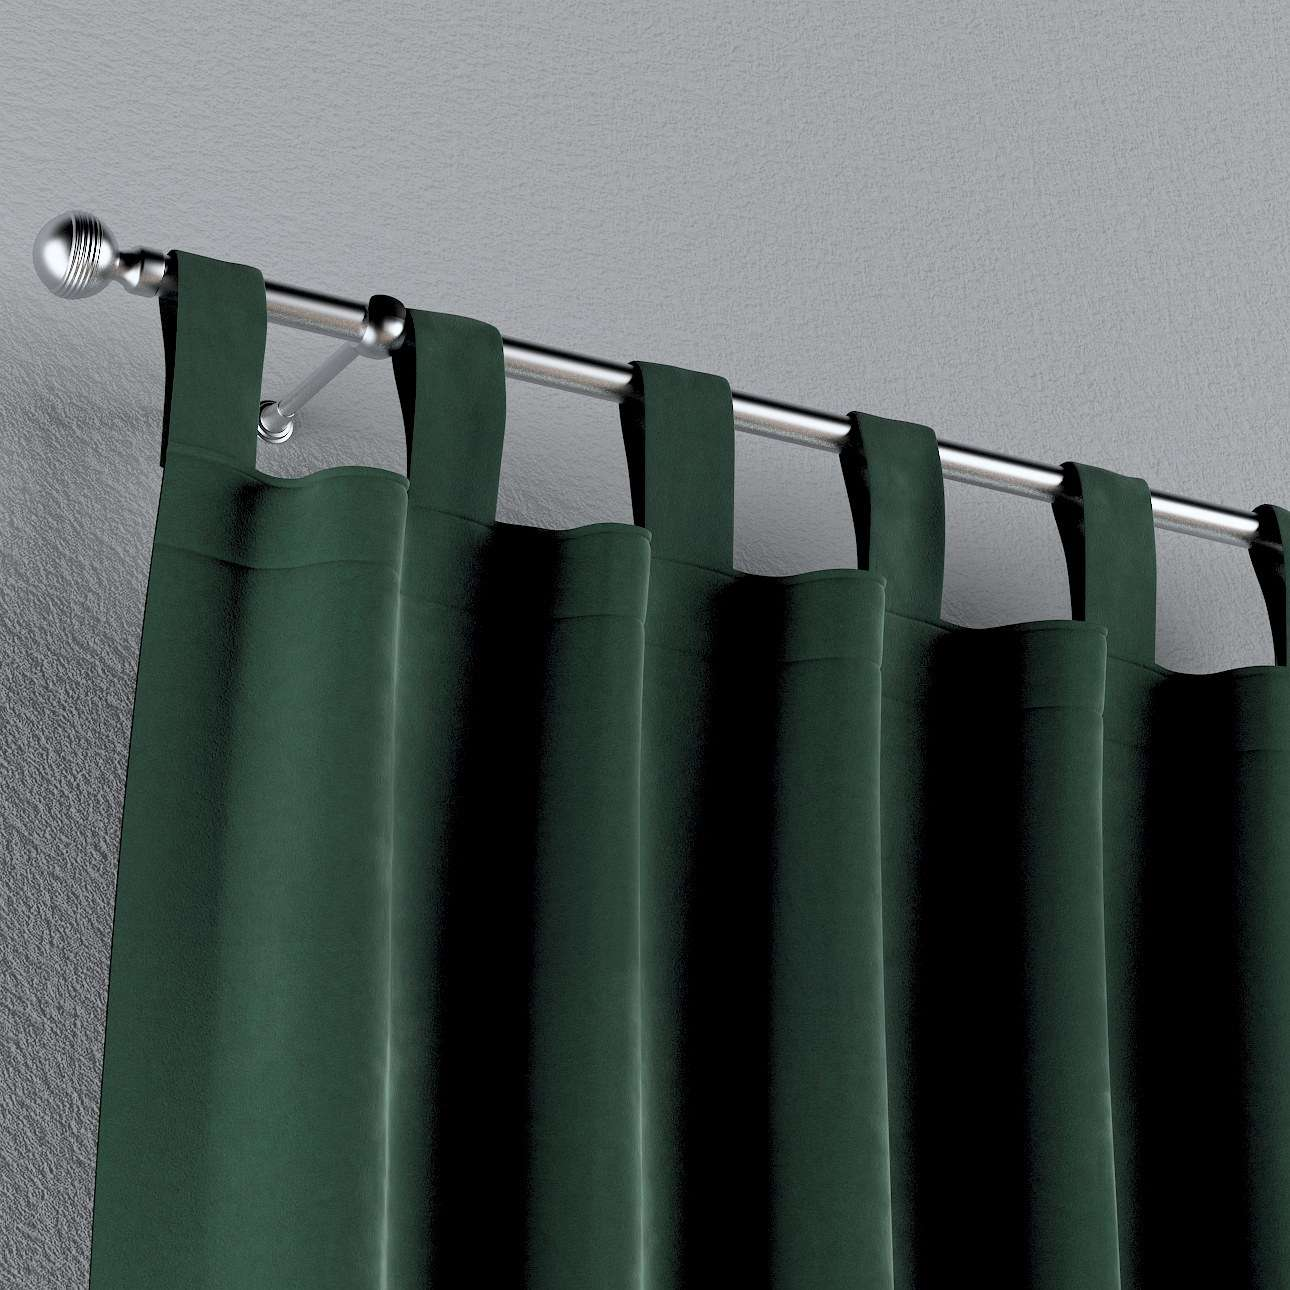 Zasłona na szelkach 1 szt. w kolekcji Velvet, tkanina: 704-25